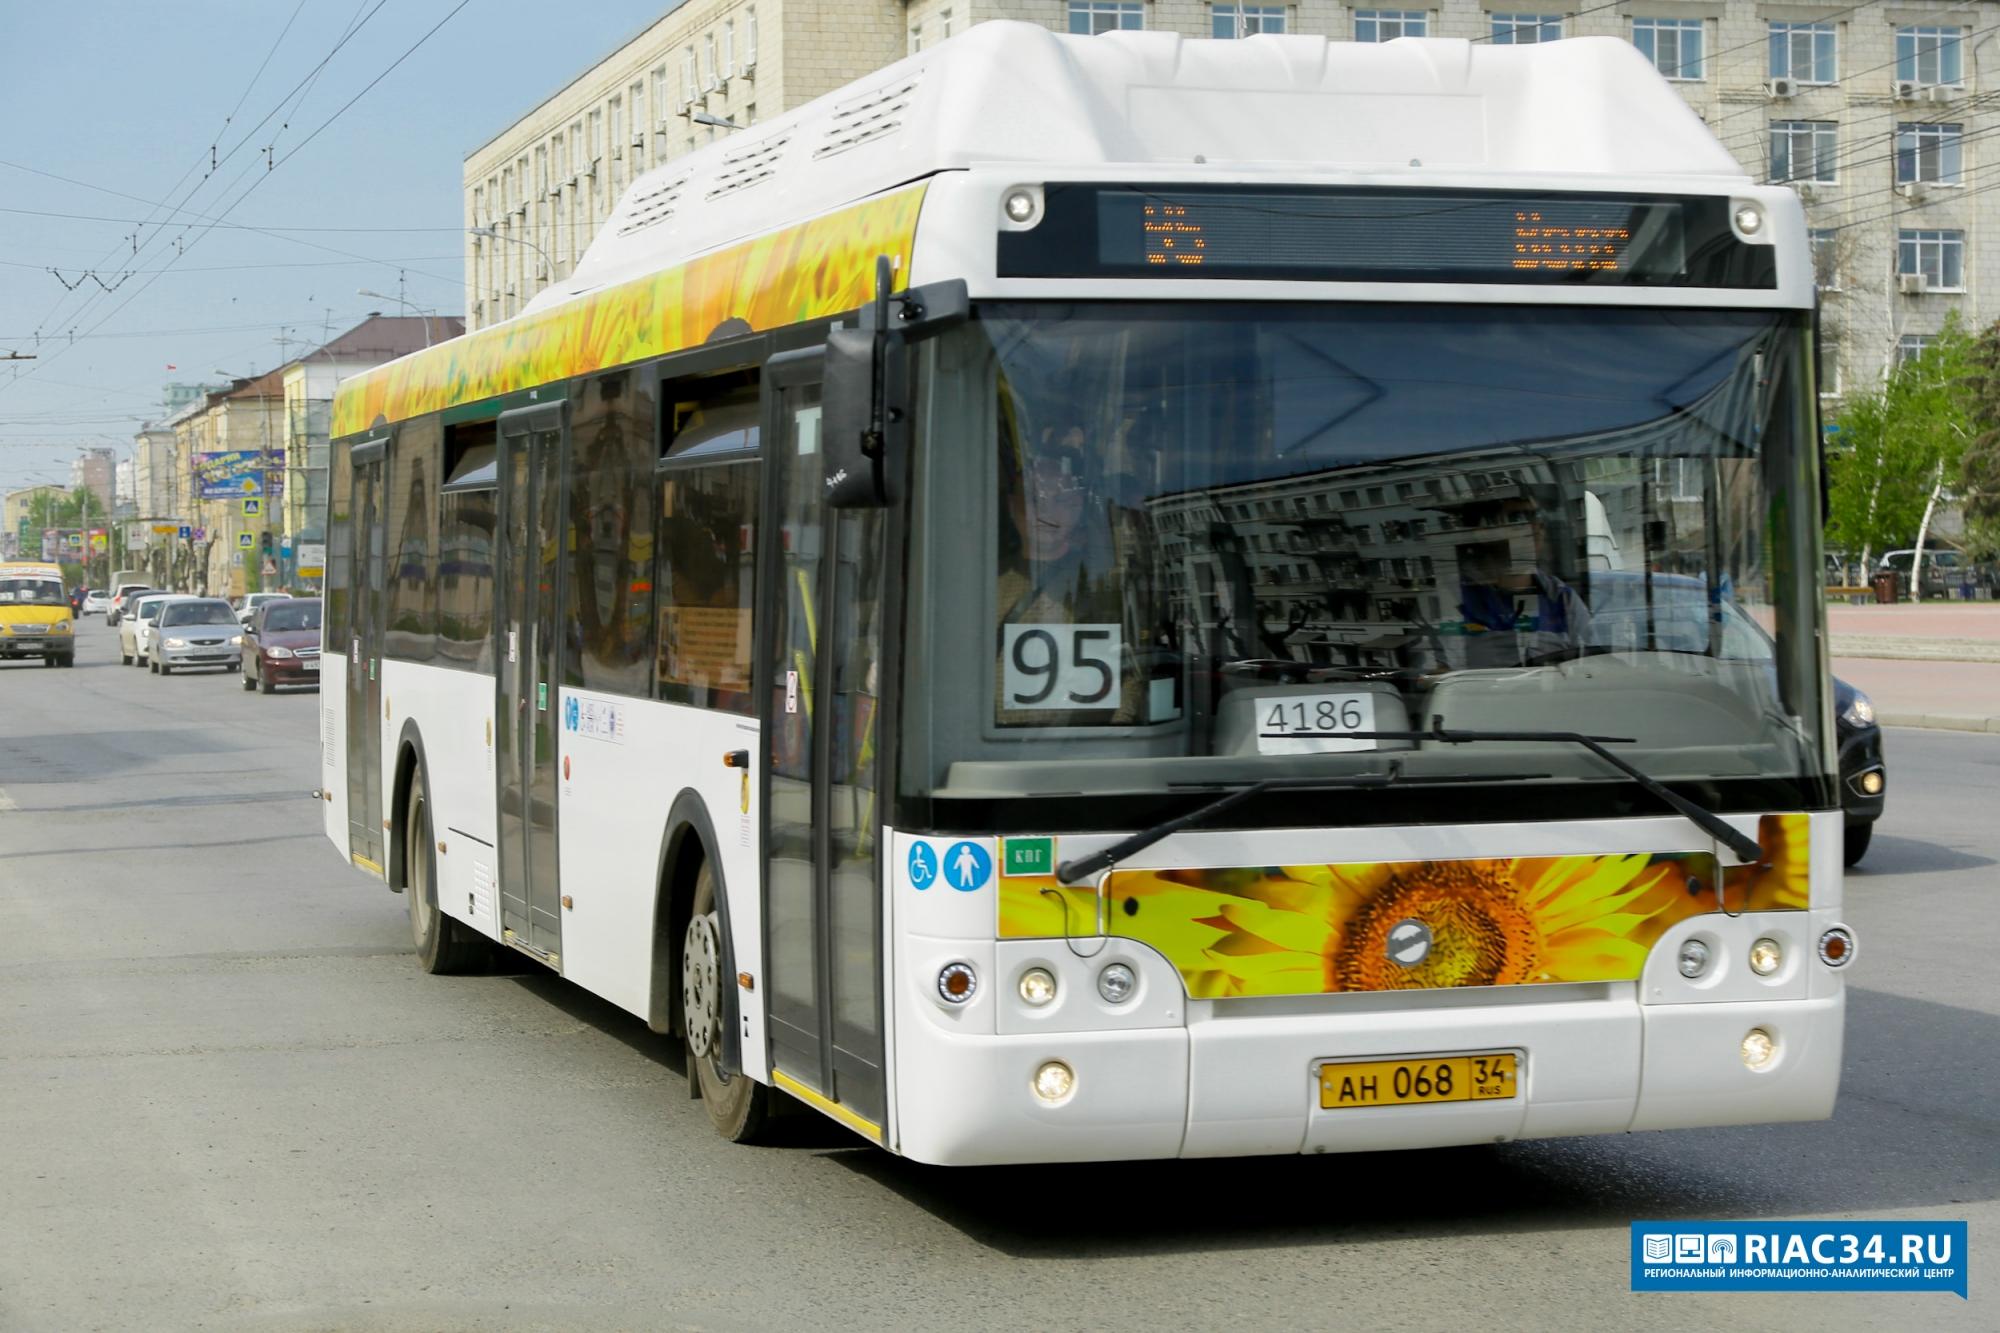 Волгоградцы настояли, чтобы автобус №95 незаезжал наТулака